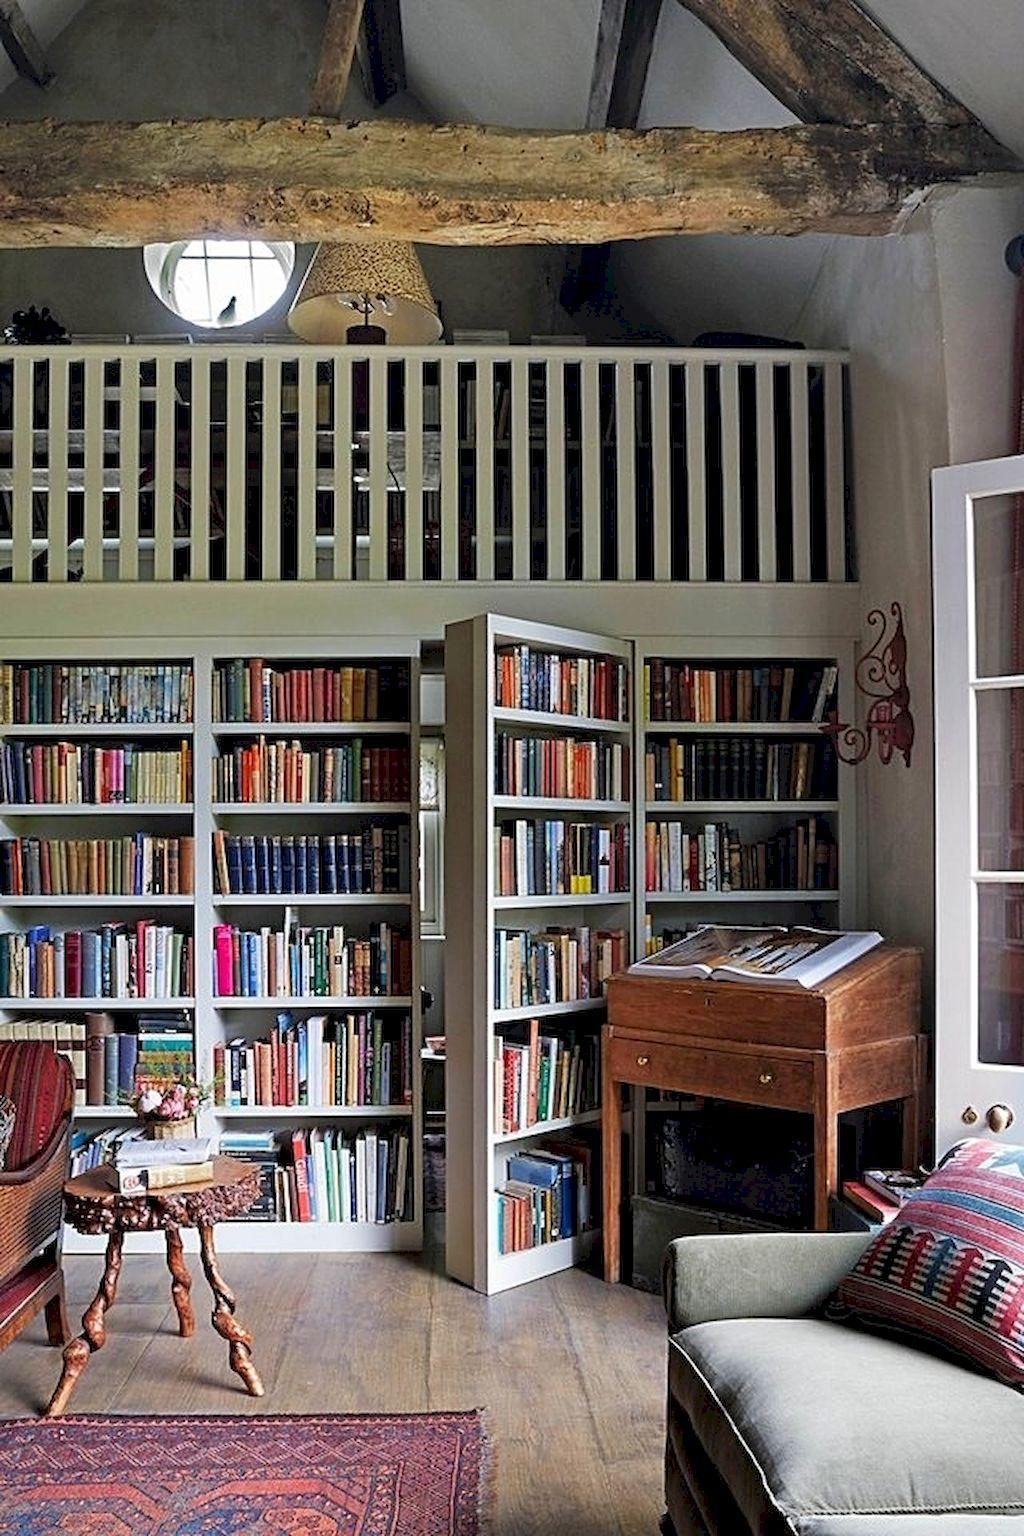 35 Insanely Creative Hidden Doors for Secret Rooms Designs Ideas